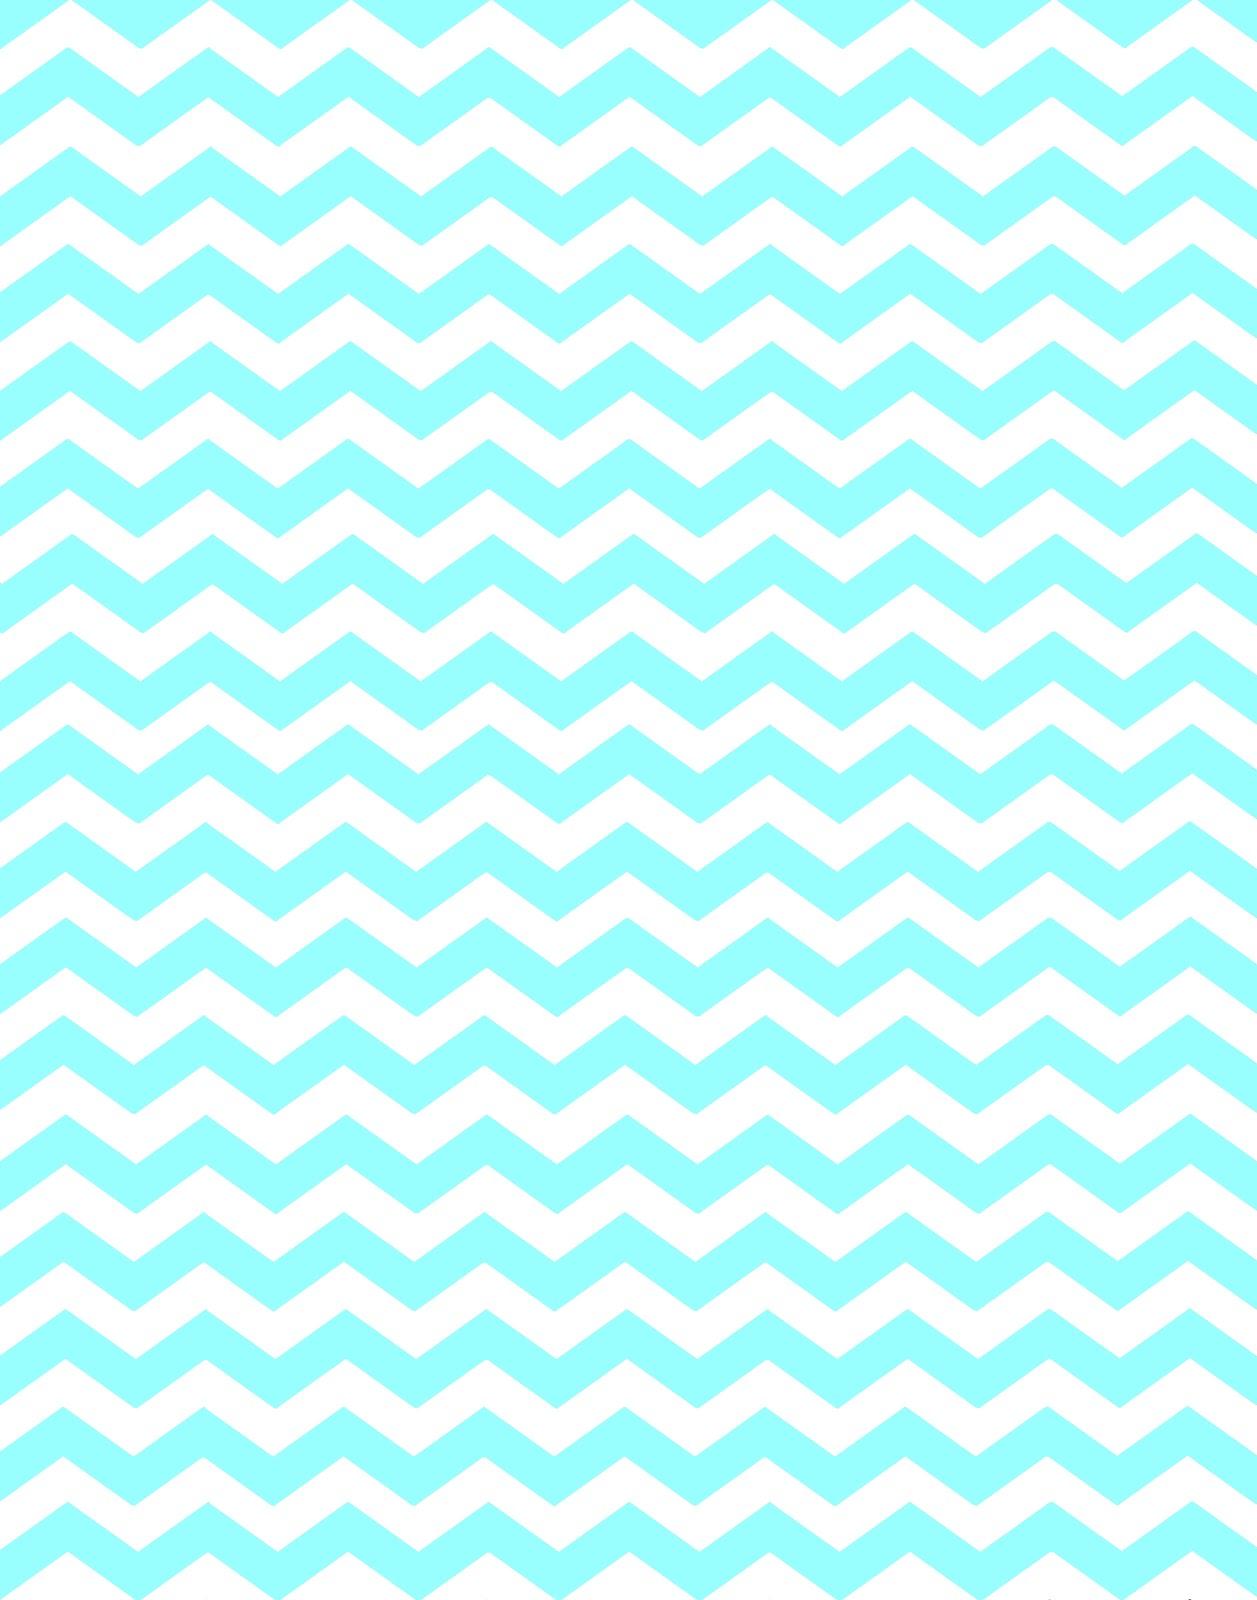 Aqua and gray chevron wallpaper wallpapersafari for Blue chevron wallpaper